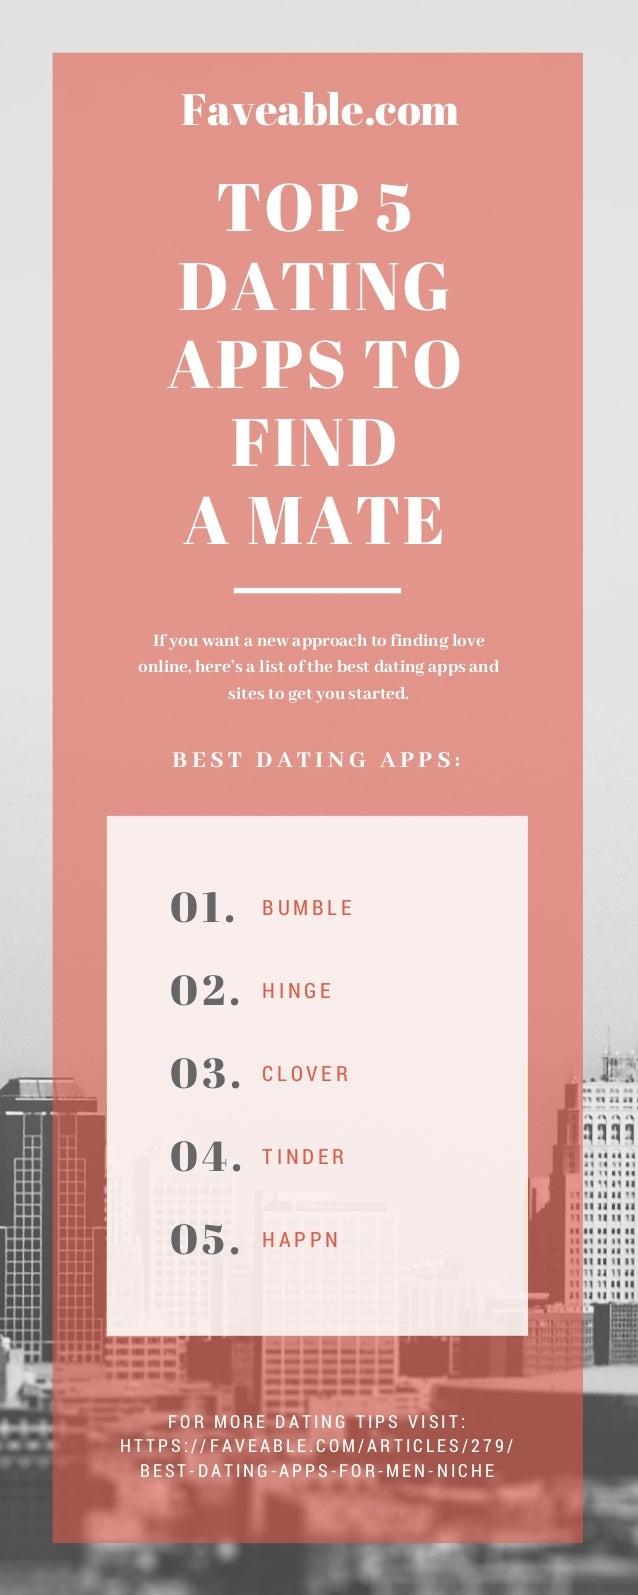 Hinge dating app not working